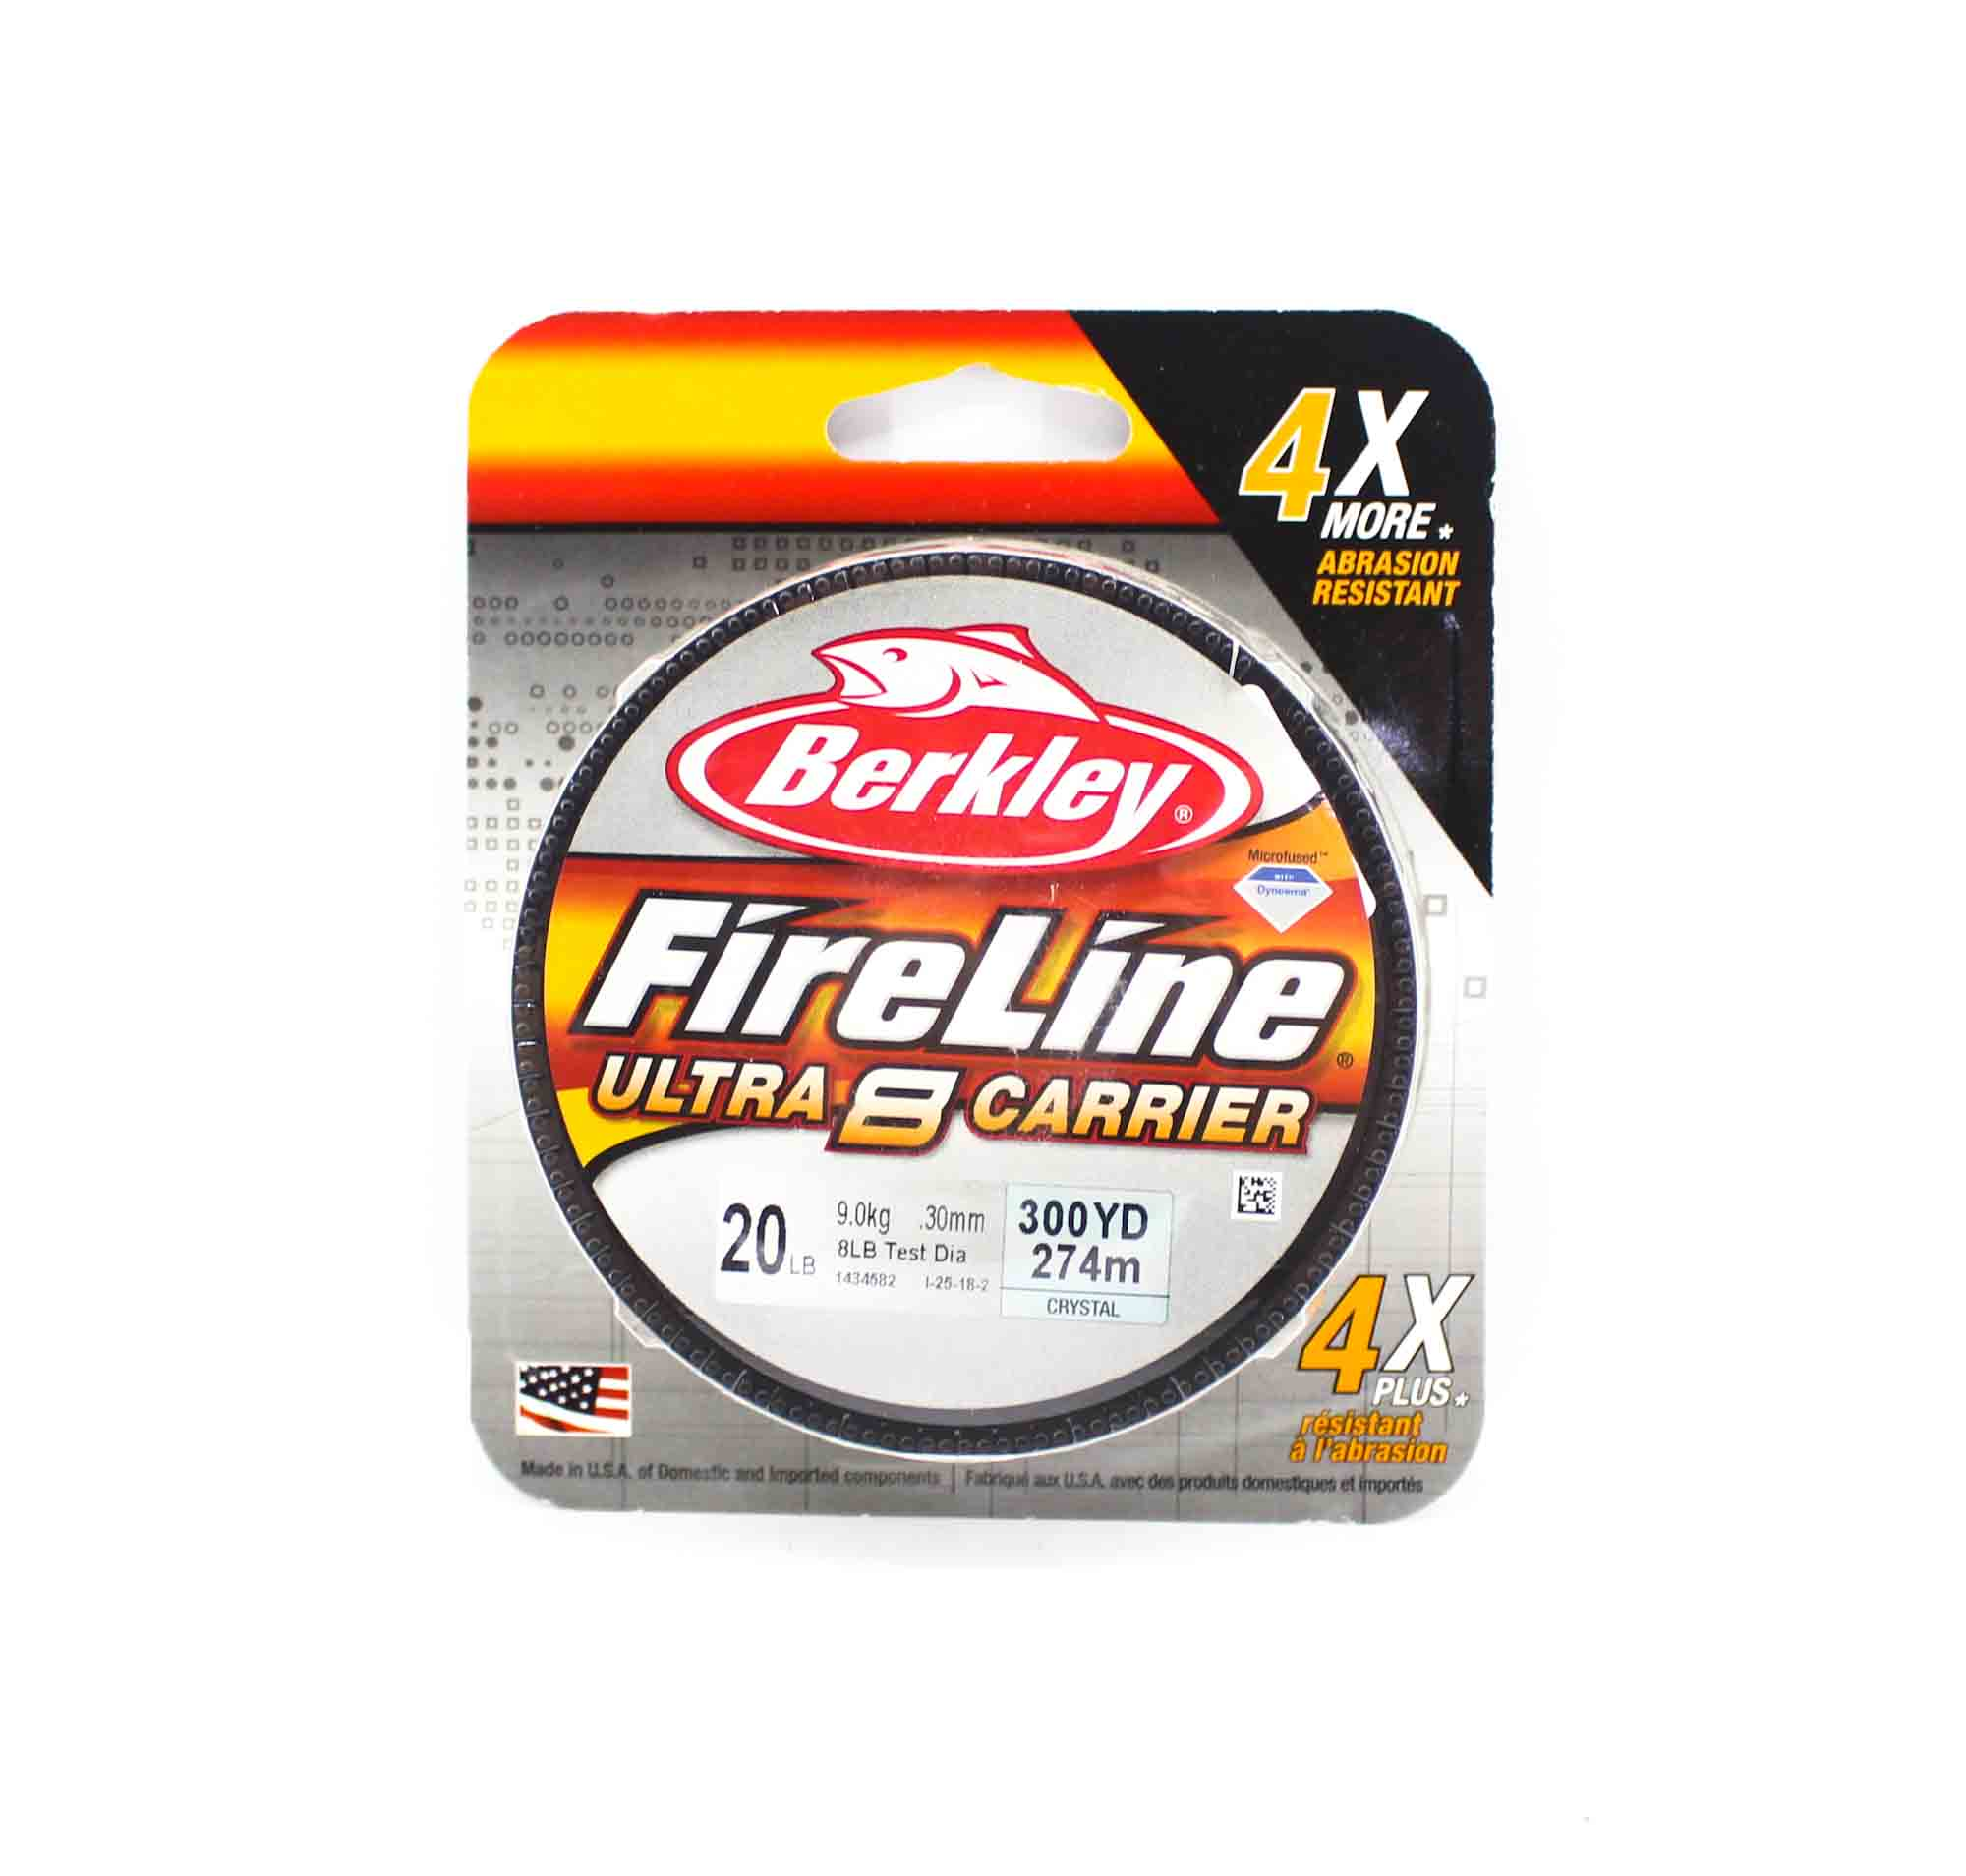 Berkley Fireline Ultra 8 Carrier 300yds 20lb White (4588)